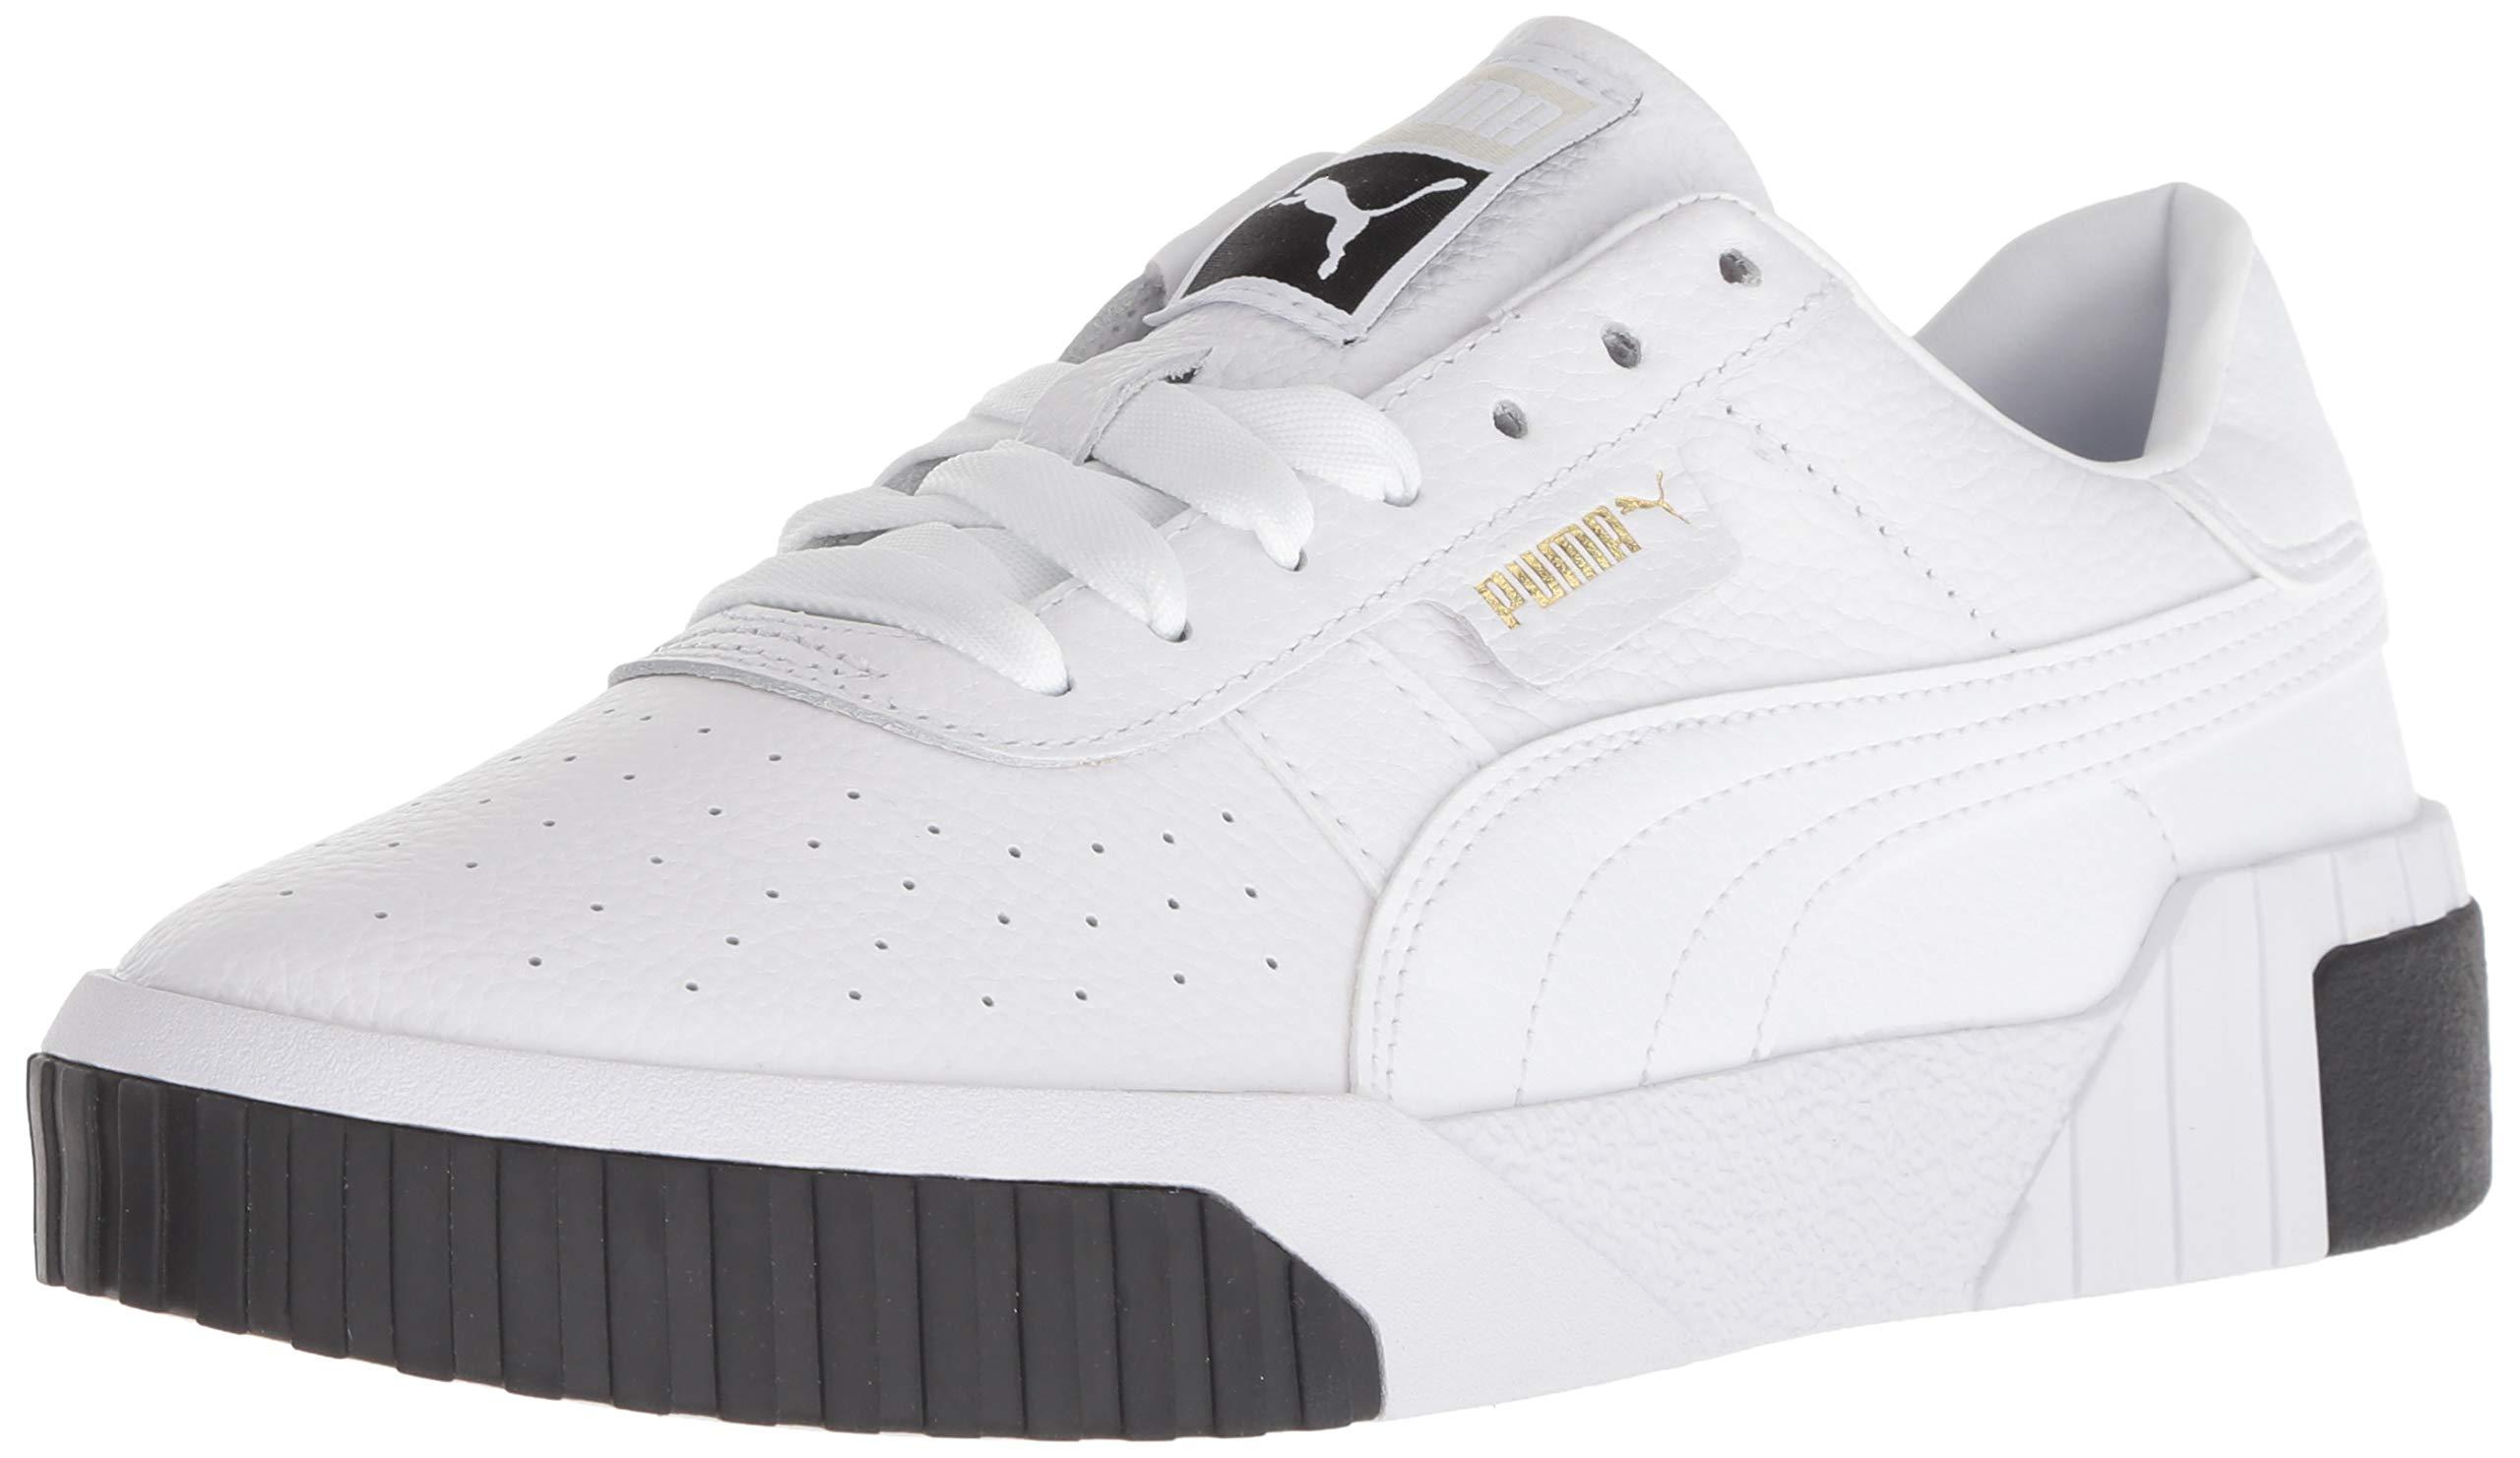 PUMA Women's CALI Sneaker White Black, 6 M US